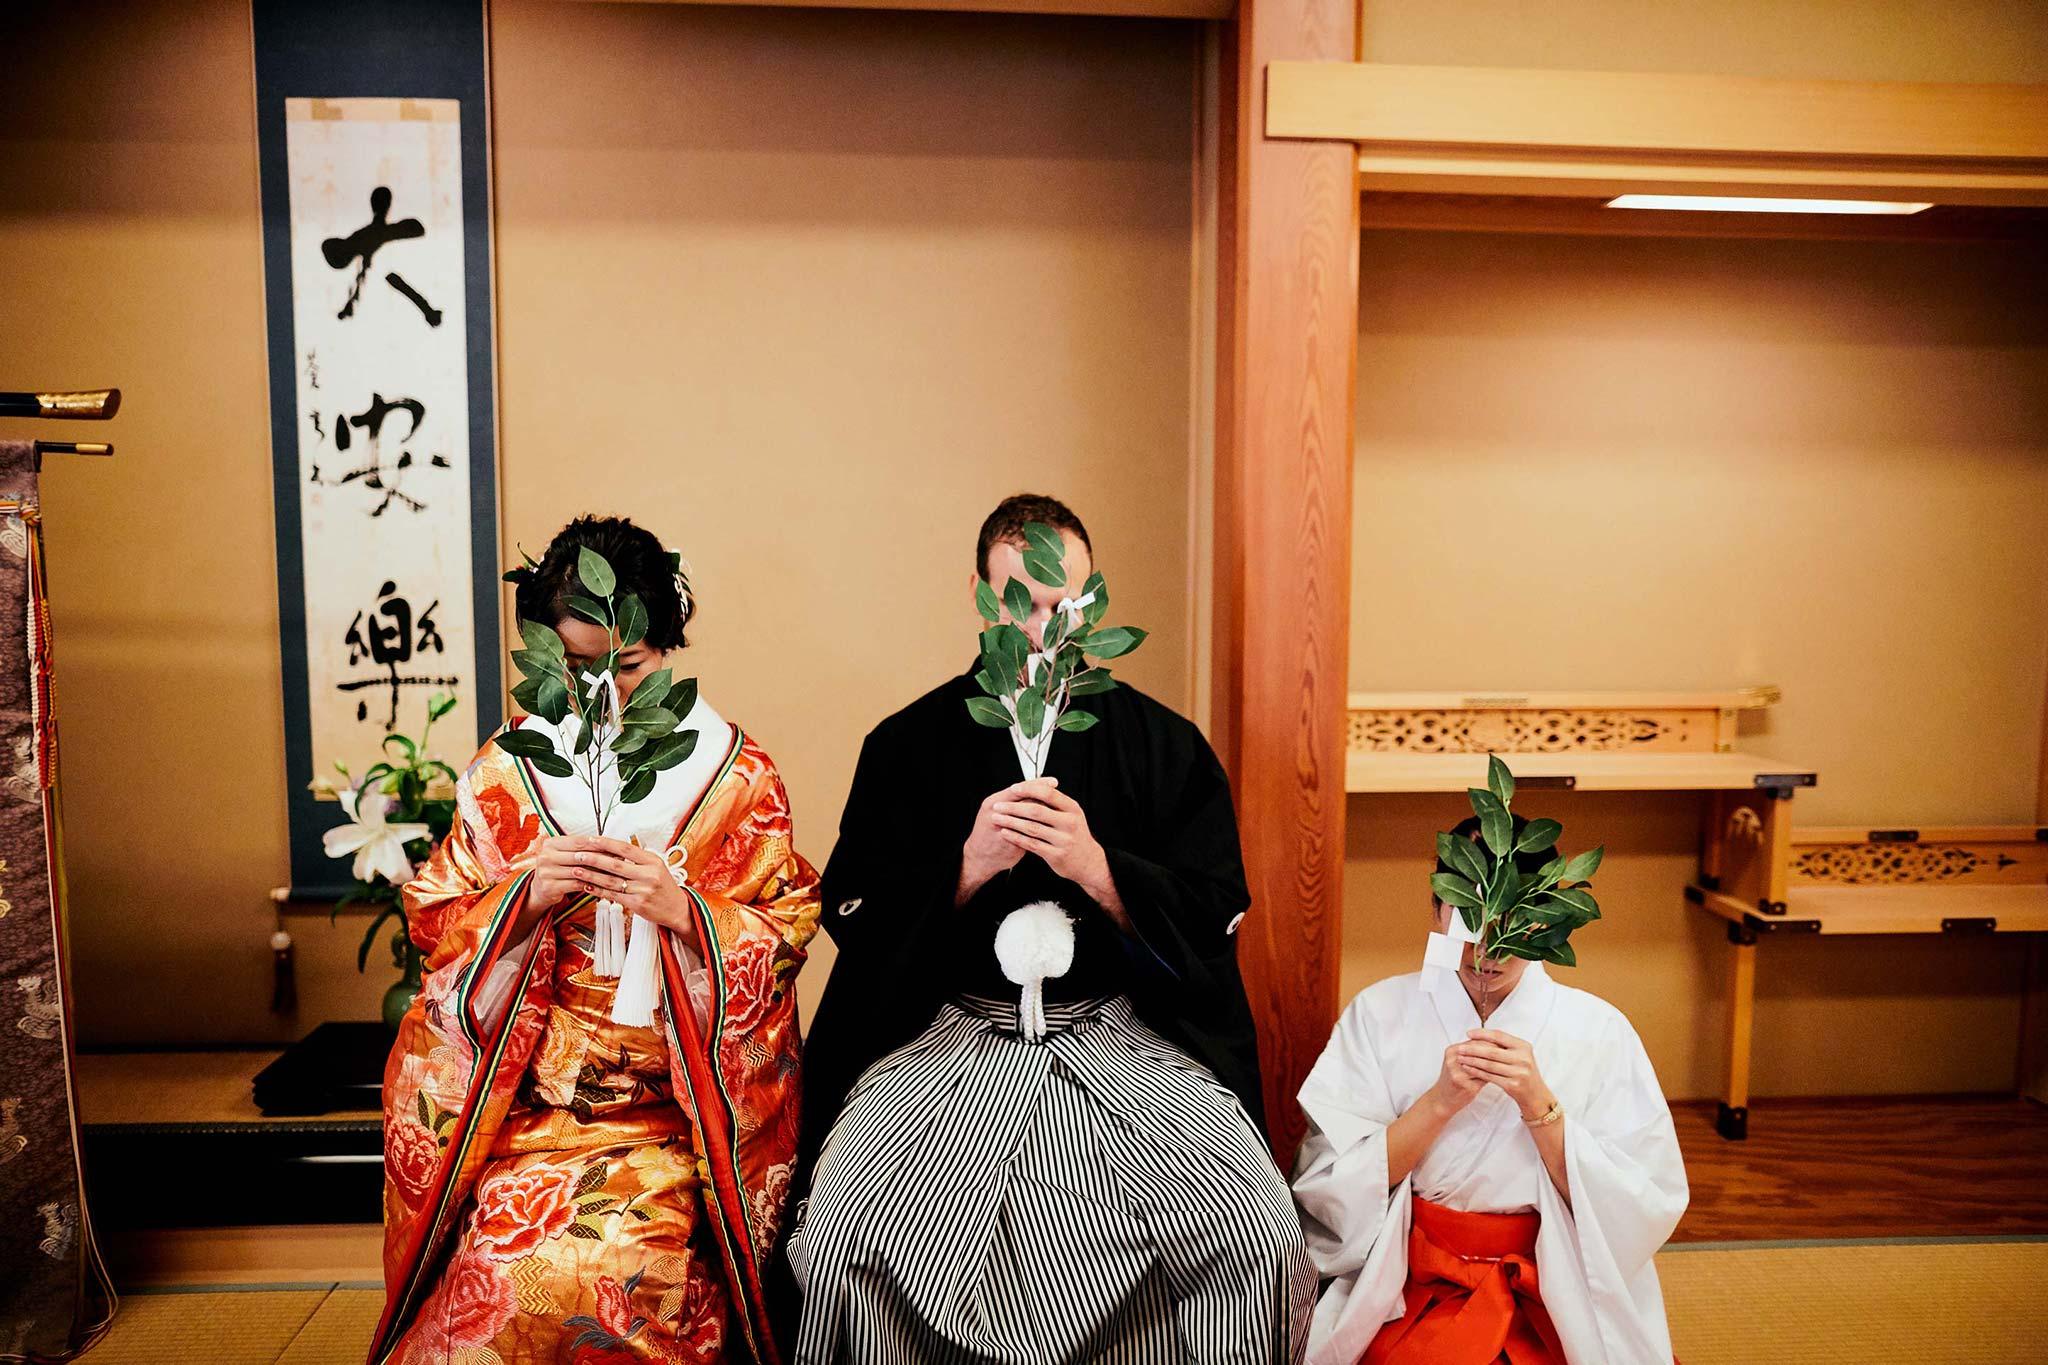 tokyo asakusa shrine traditional wedding ritual practice